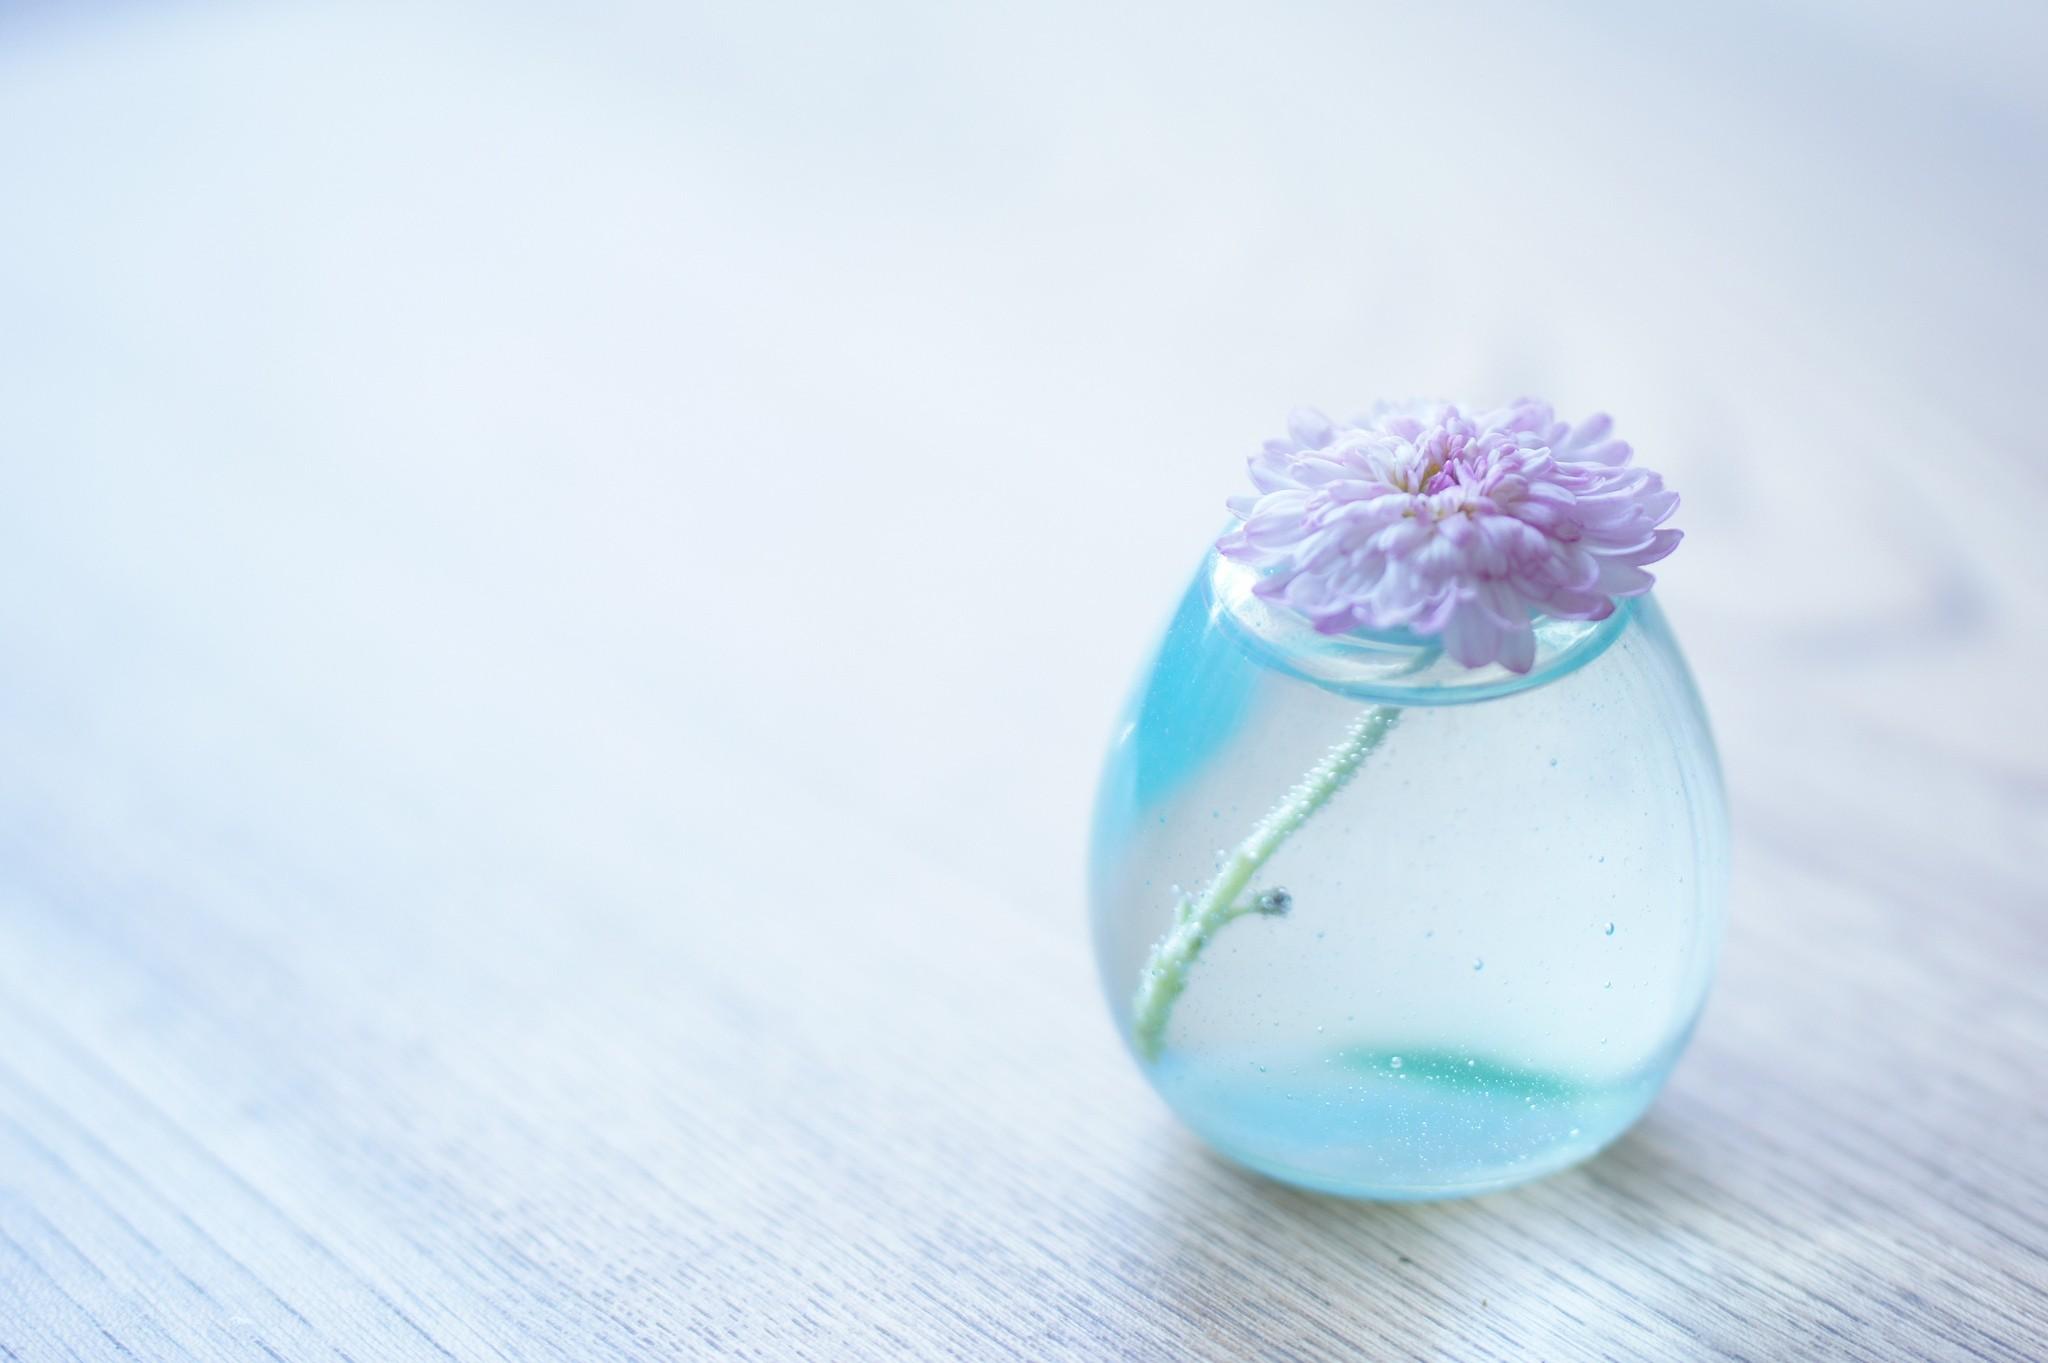 Table Blue Glass Flower Hand Petal Vase Macro Photography